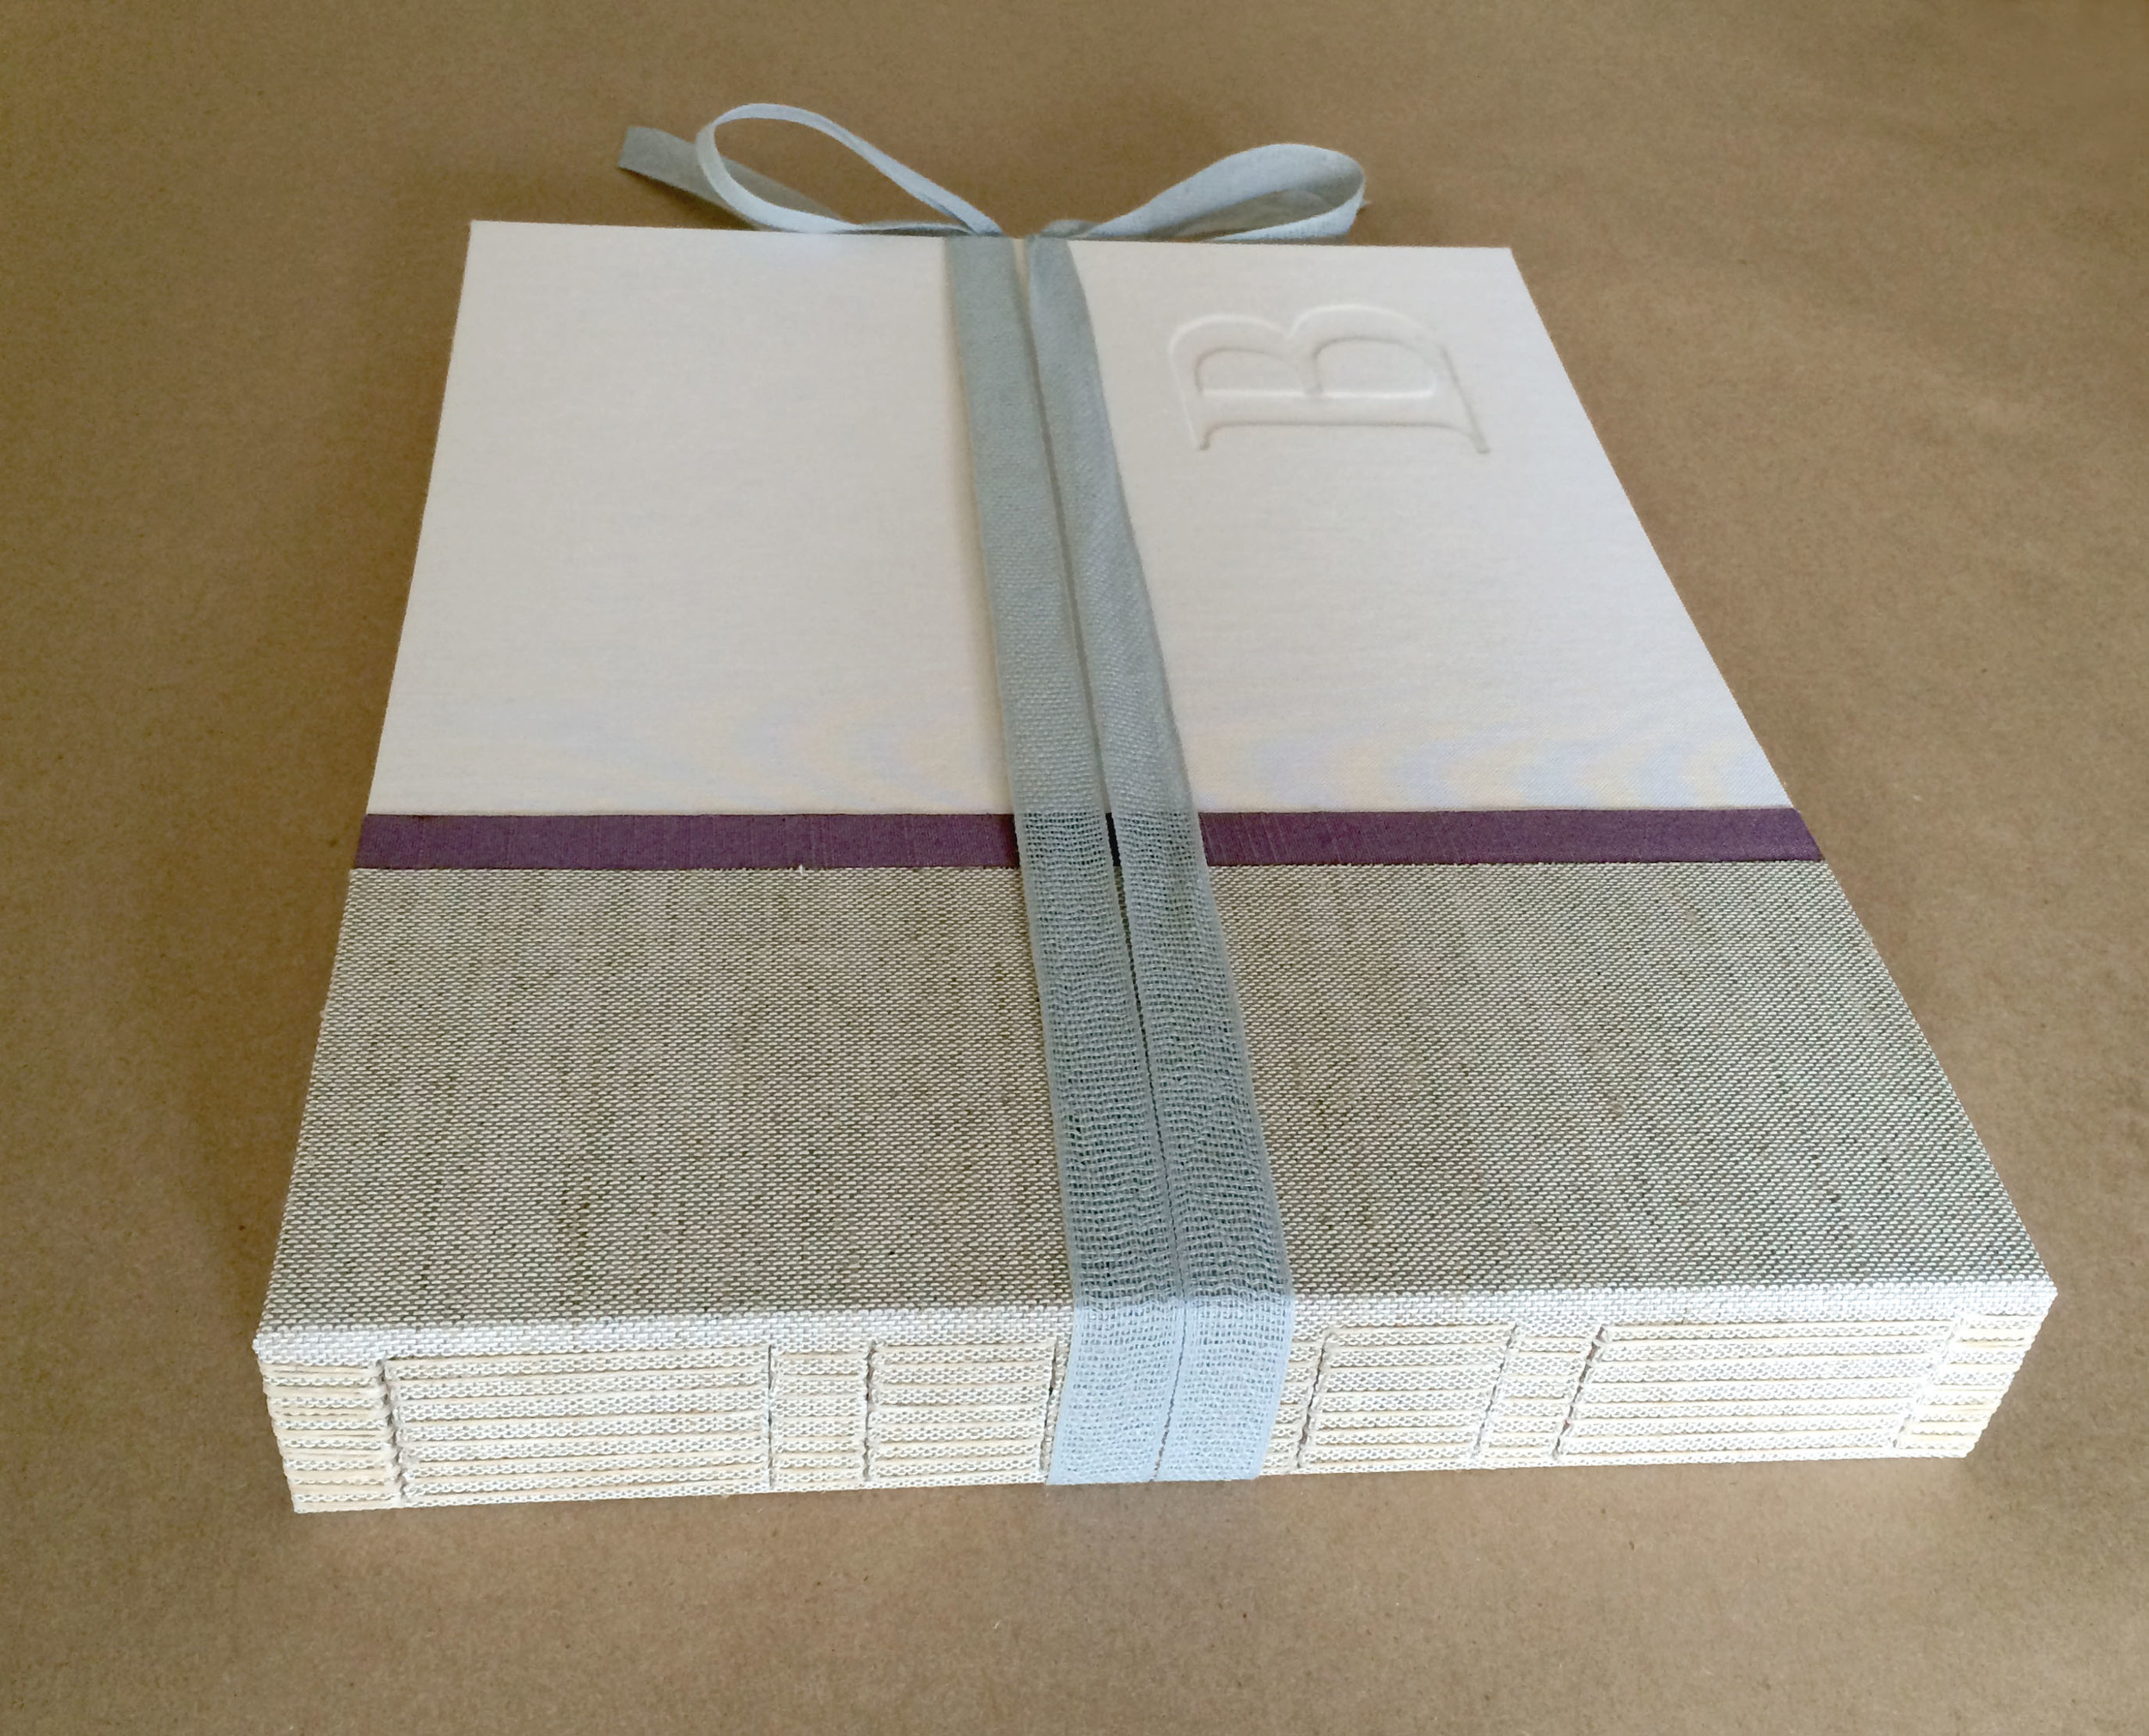 Danica and Eddye's Book_spine.jpg